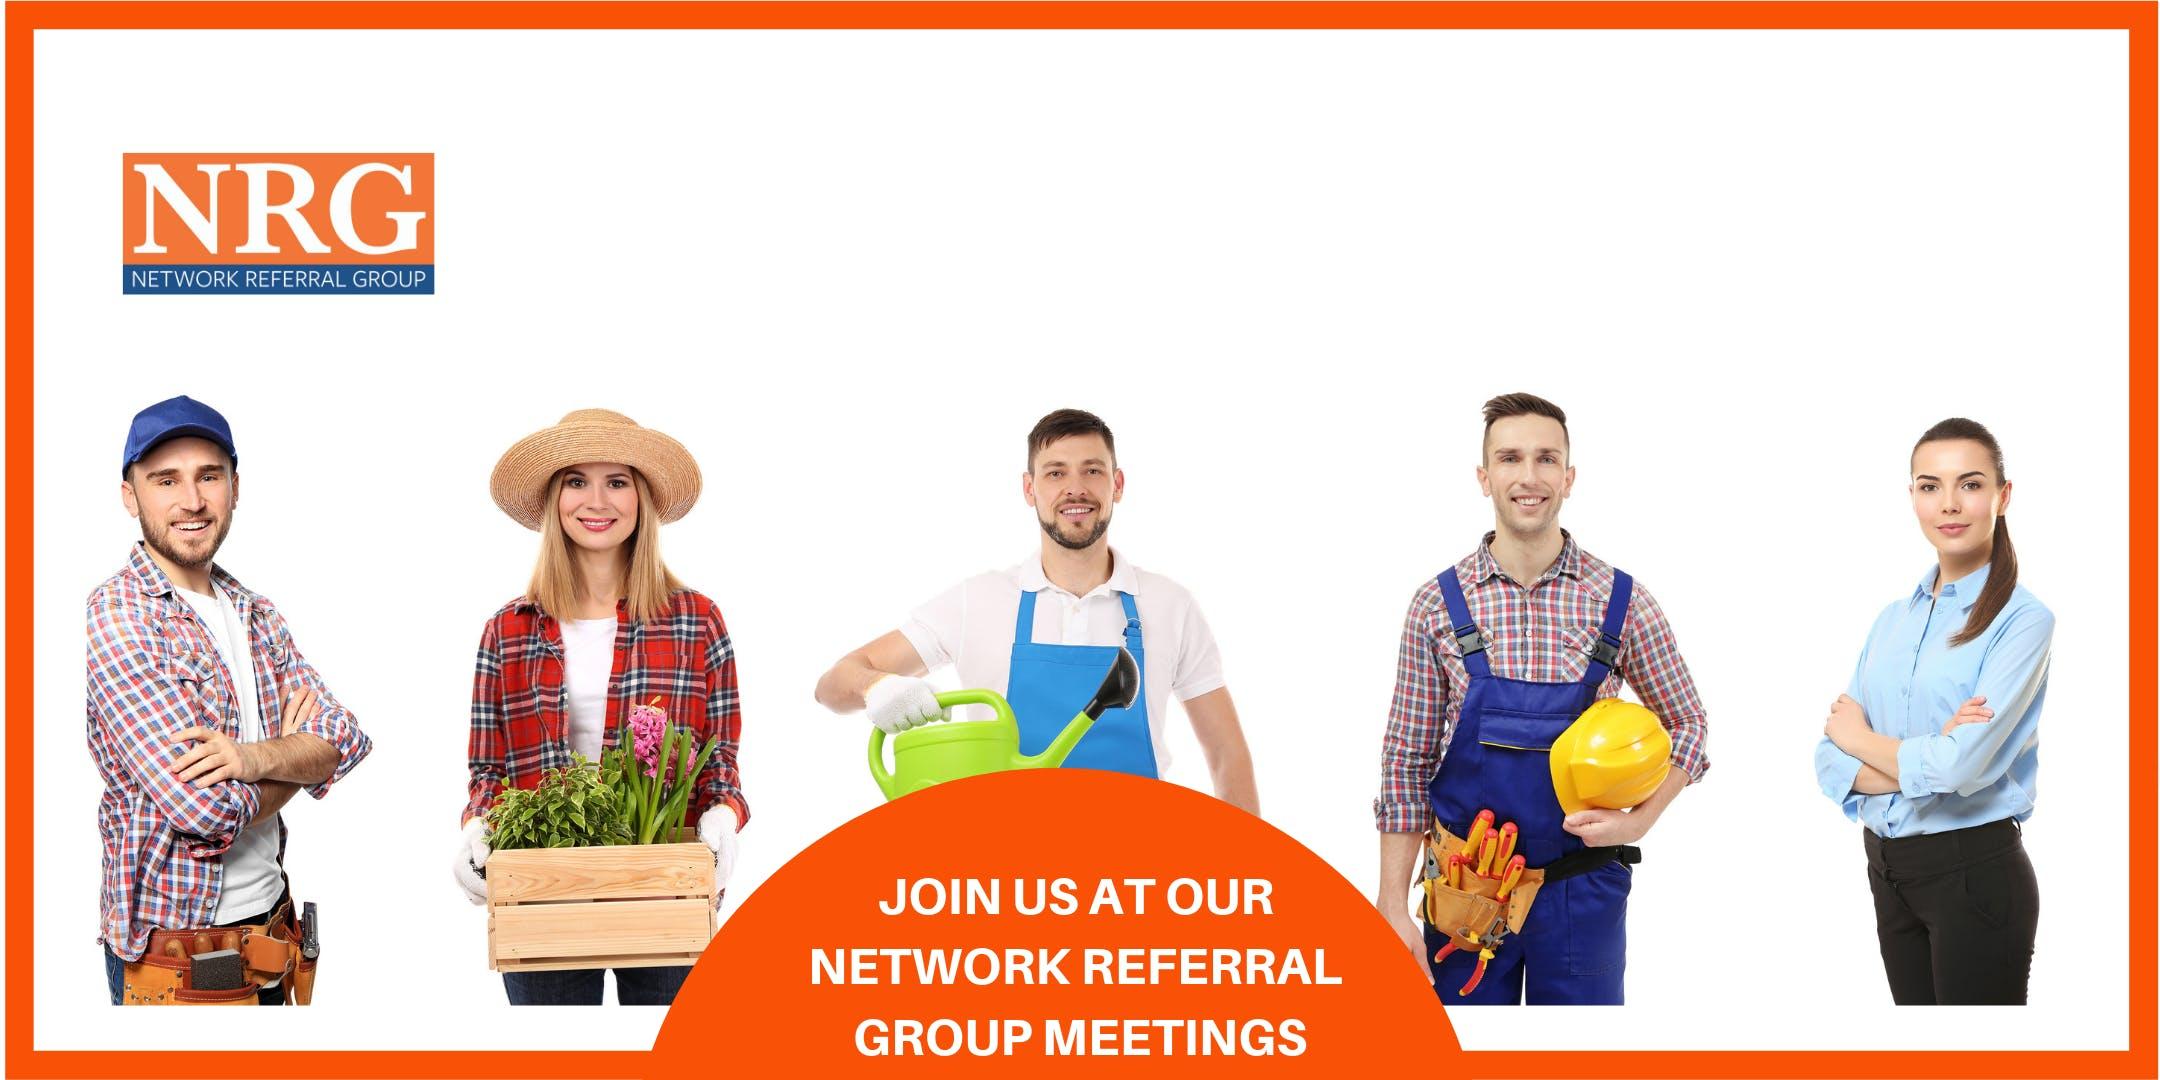 NRG Midland Networking Meeting